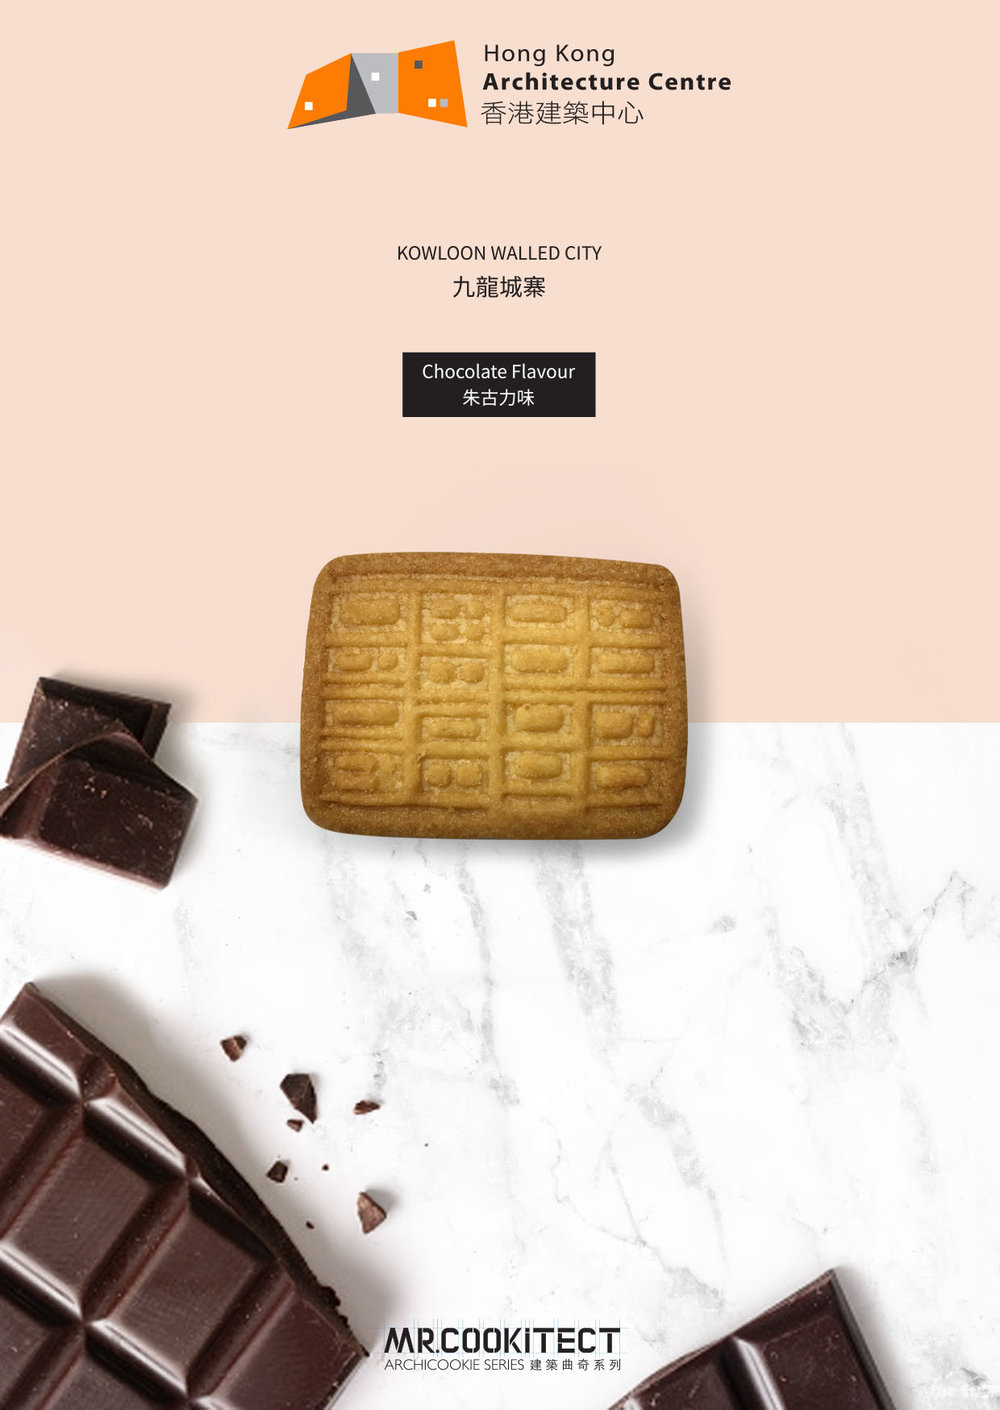 20160825-cookie flavour2.jpg